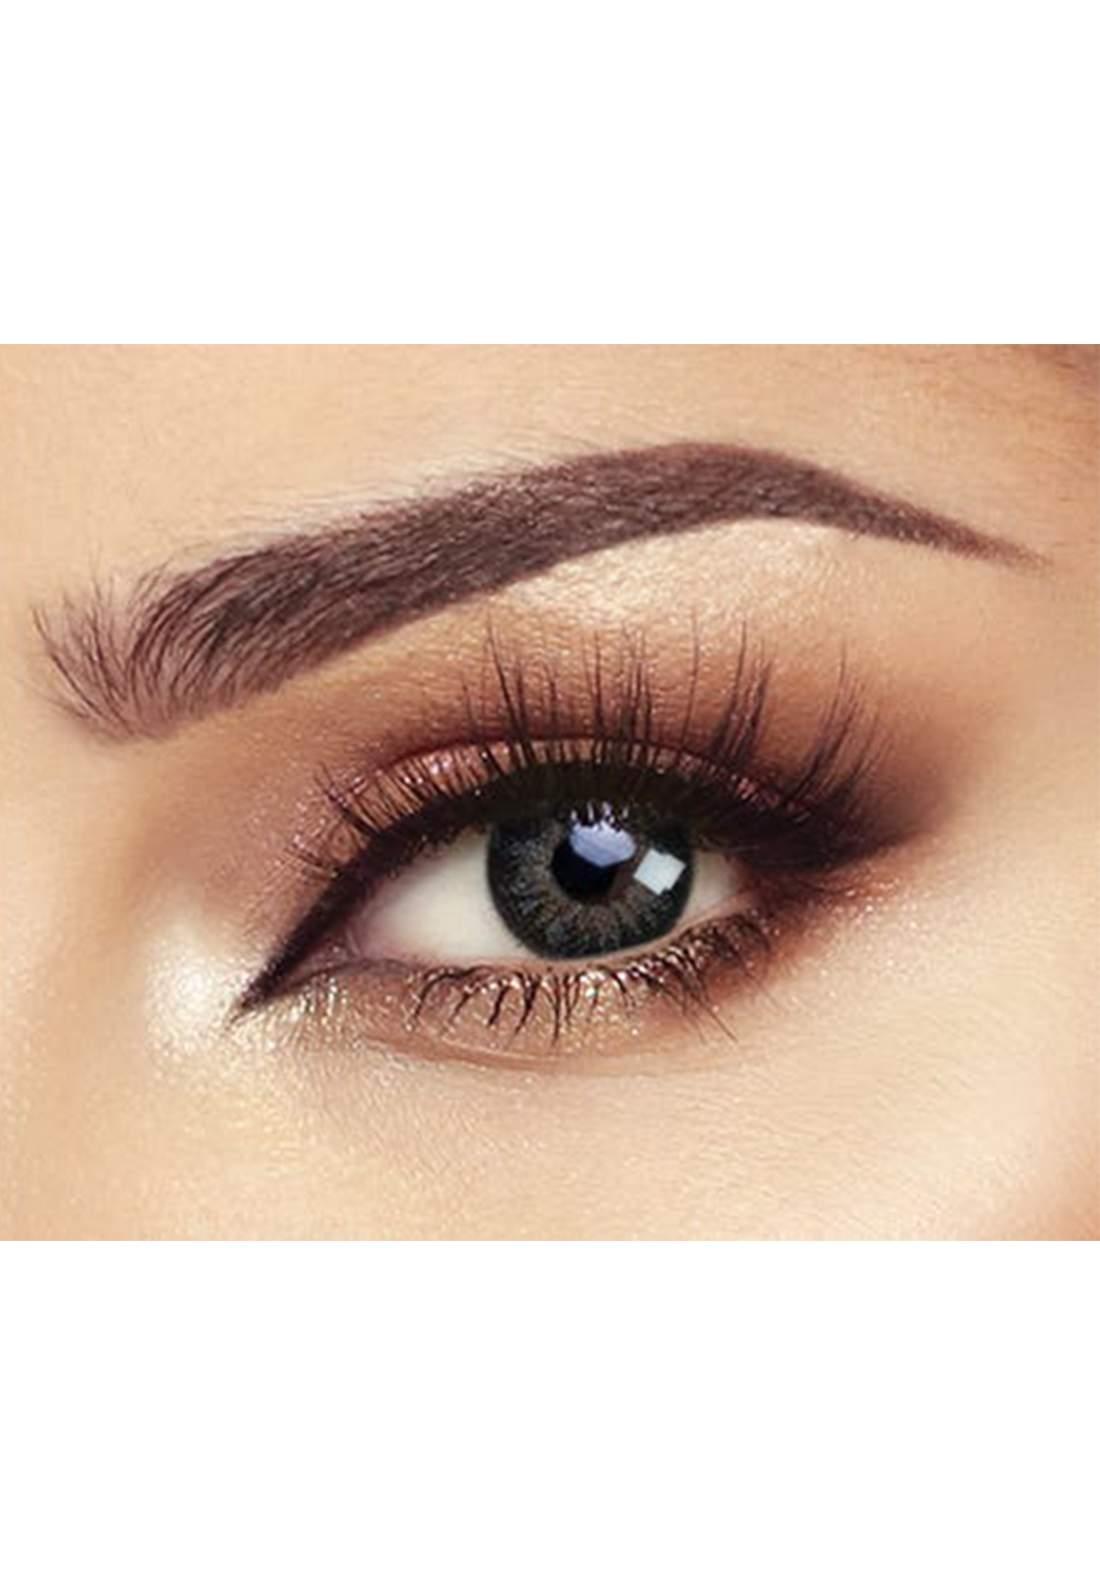 Bella Classic 301029 Contact Lenses 3 Months Use Snow White - Satin Gray  No.30 عدسات لاصقة